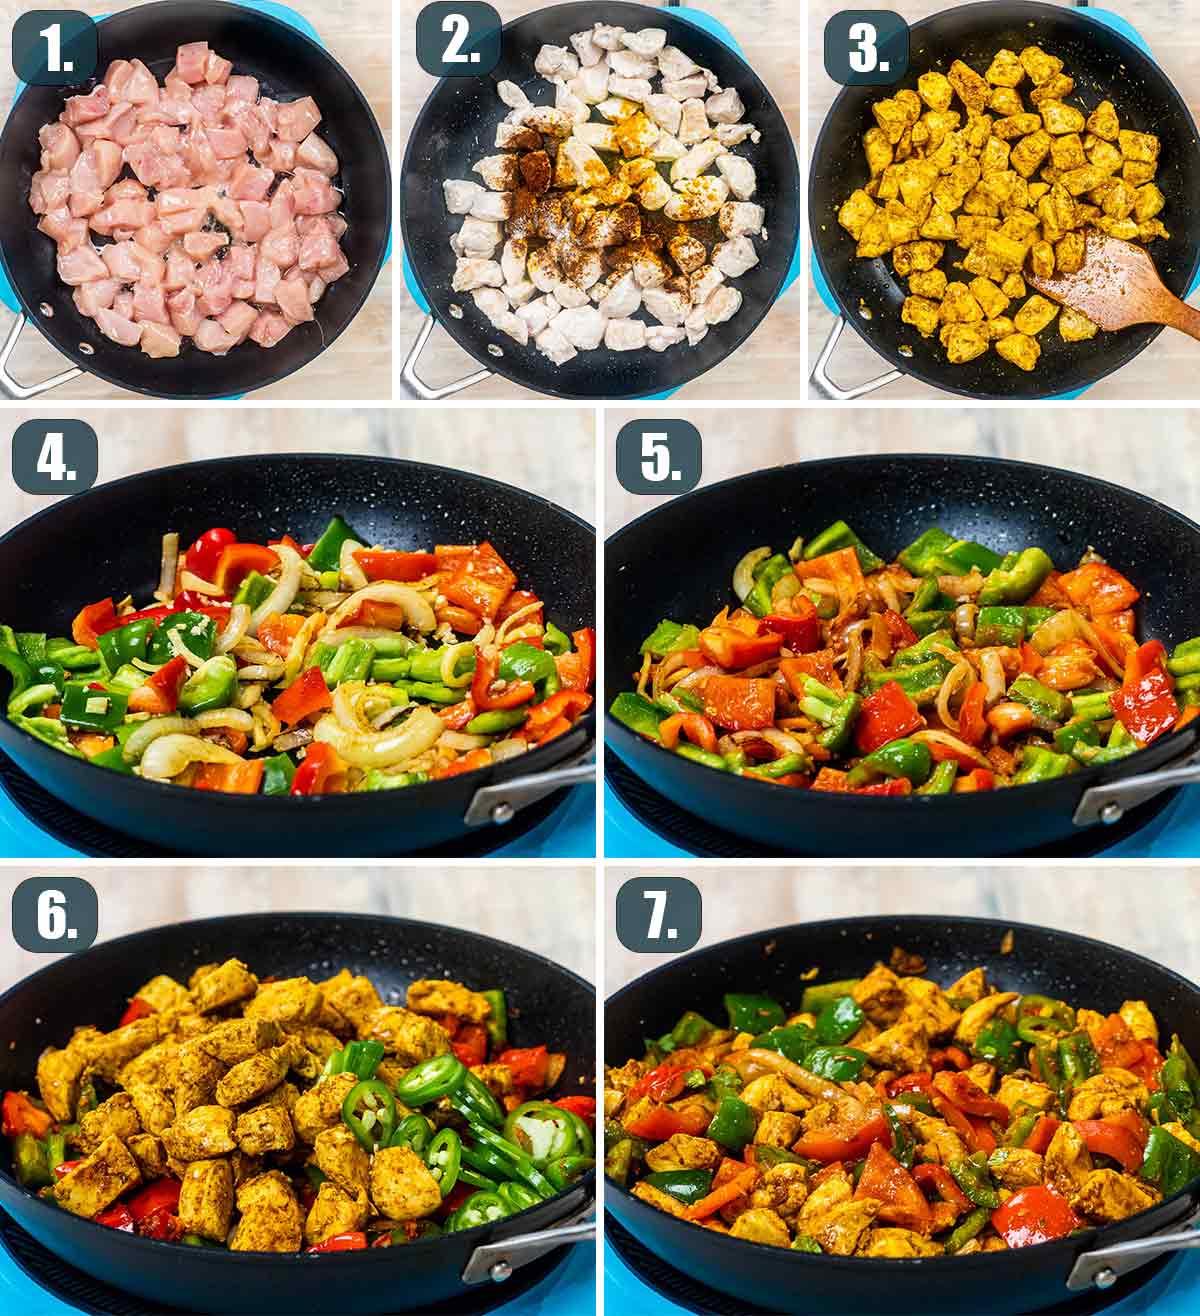 detailed process shots showing how to make chicken jalfrezi.